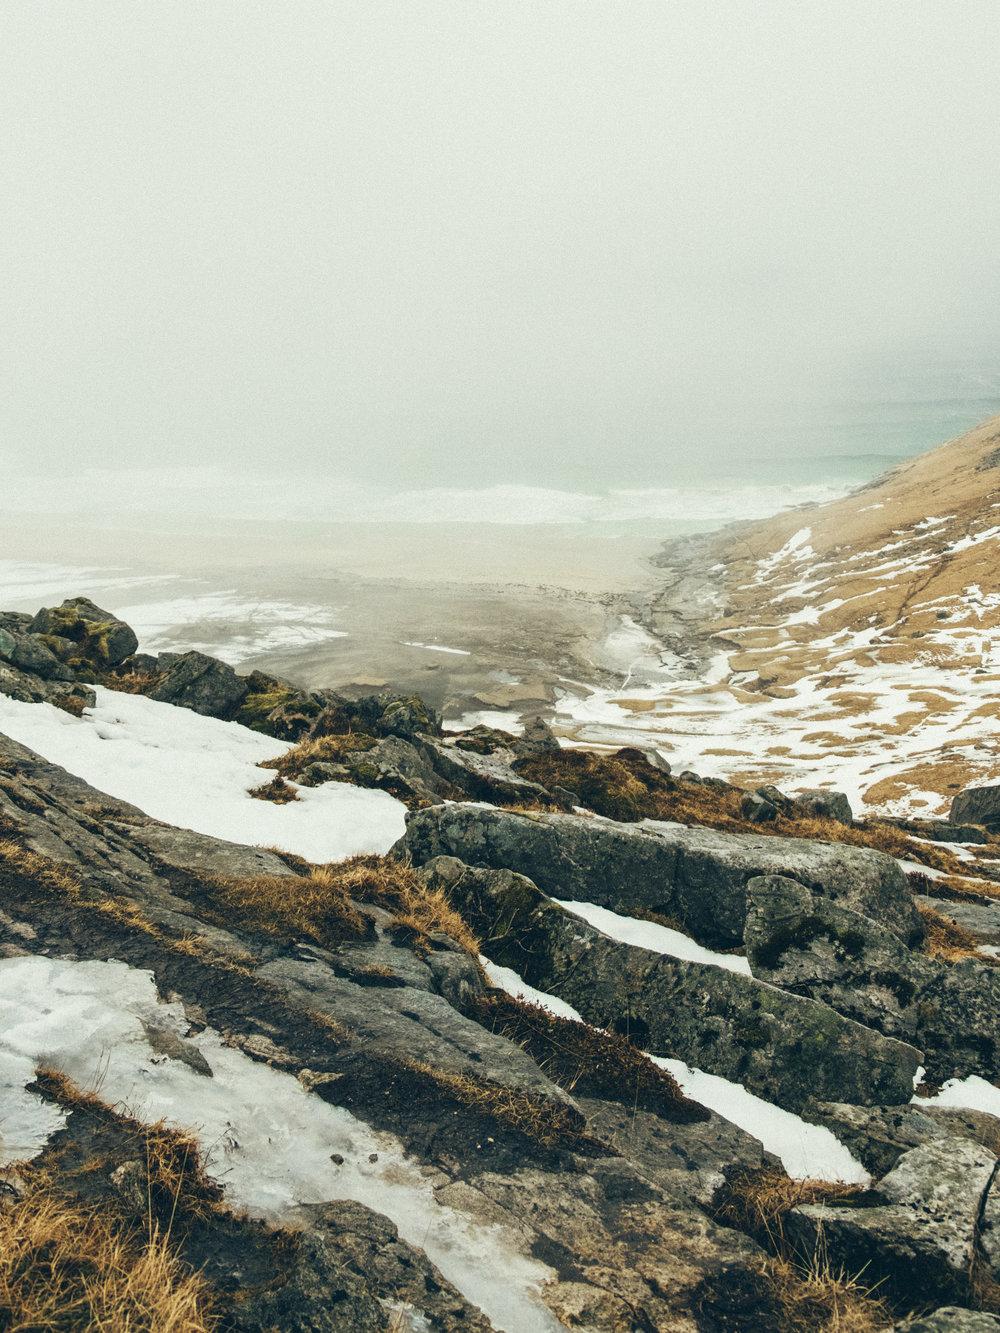 kvalvika-beach-hiking-lofoten